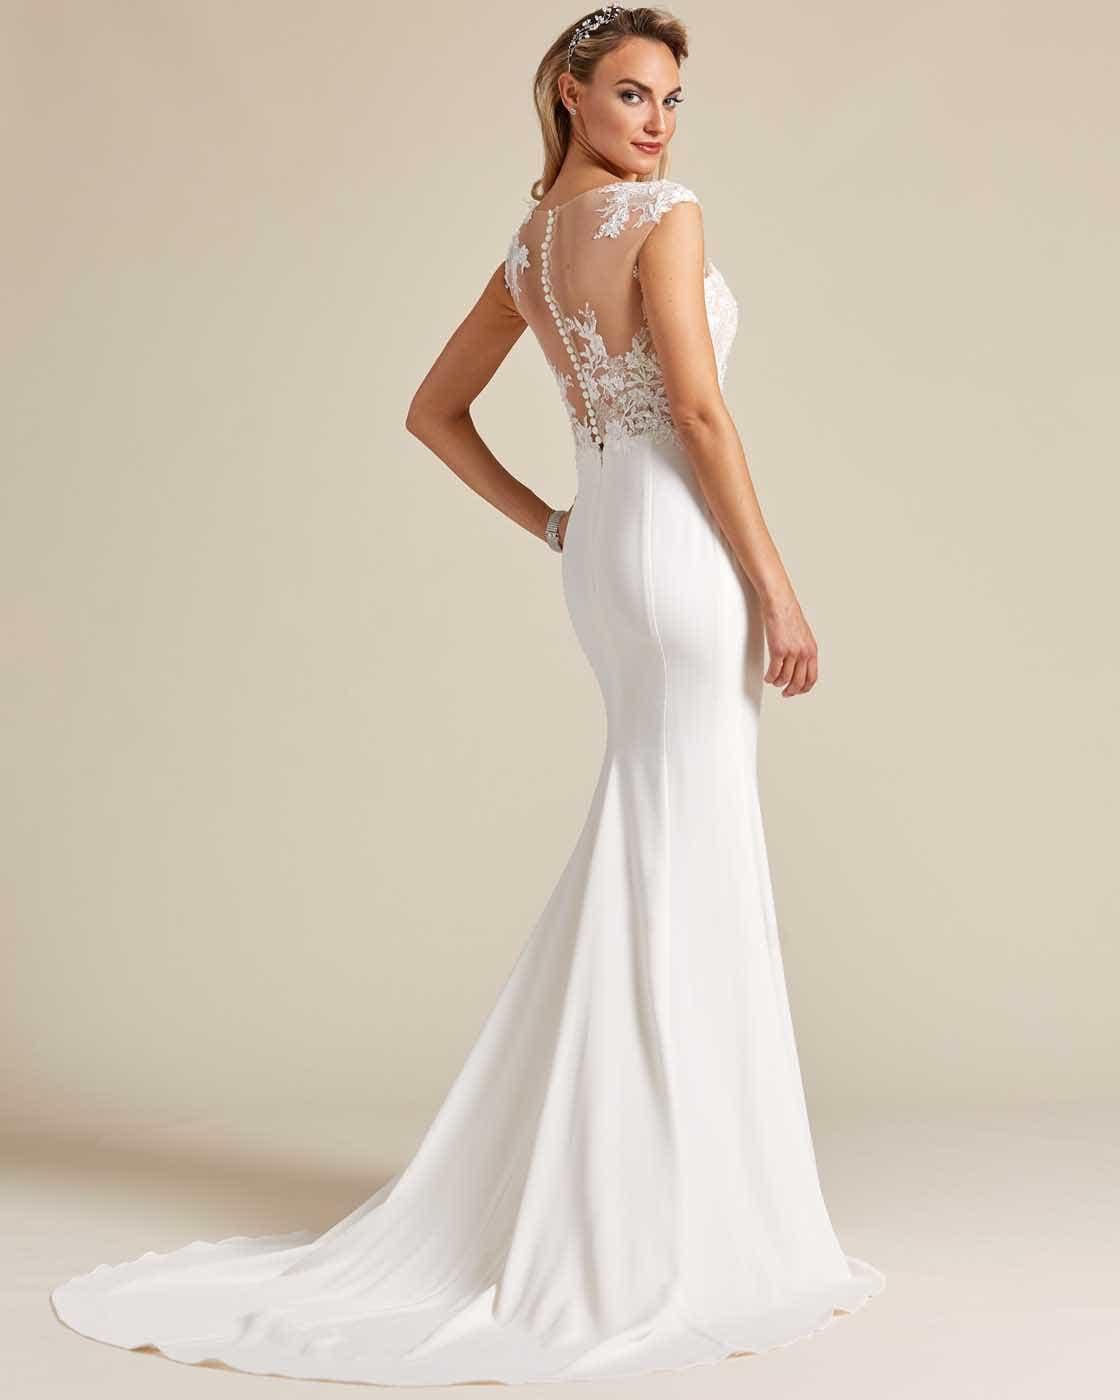 Cream White Button Down Back Wedding Dress - Back